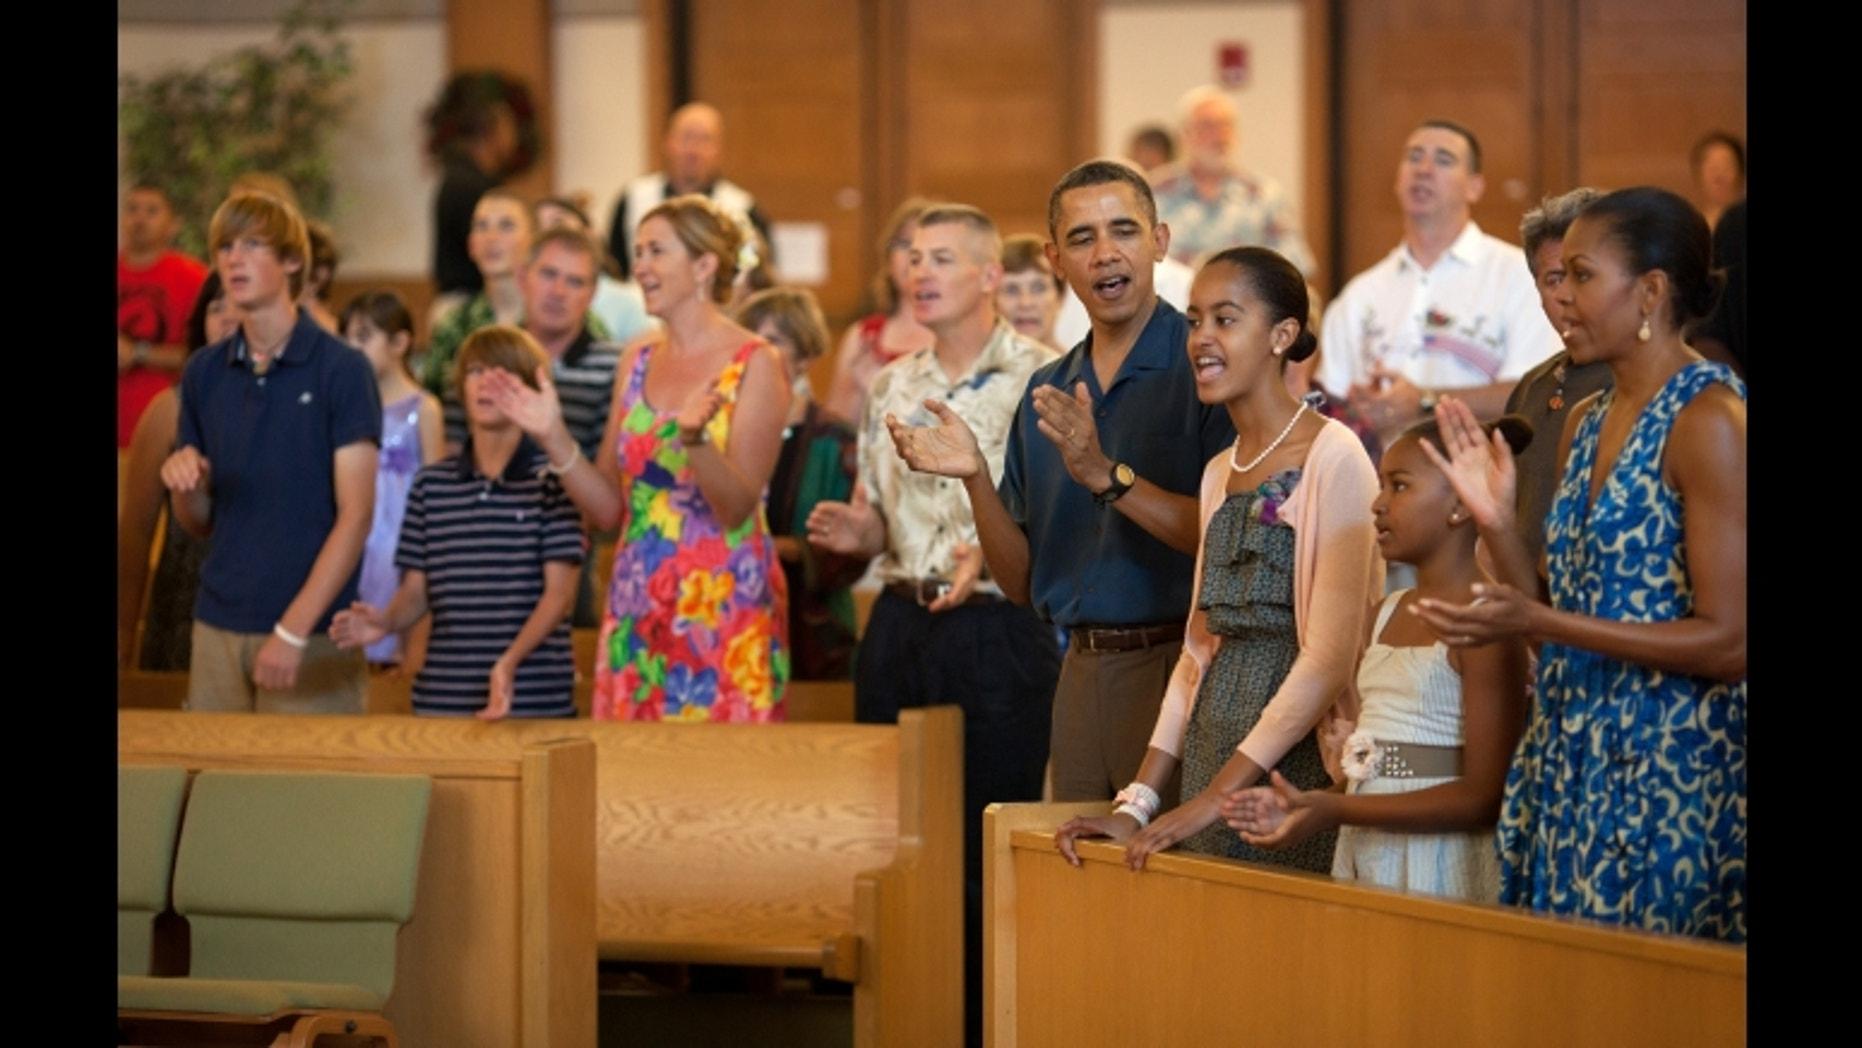 White House Photo by Pete Souza